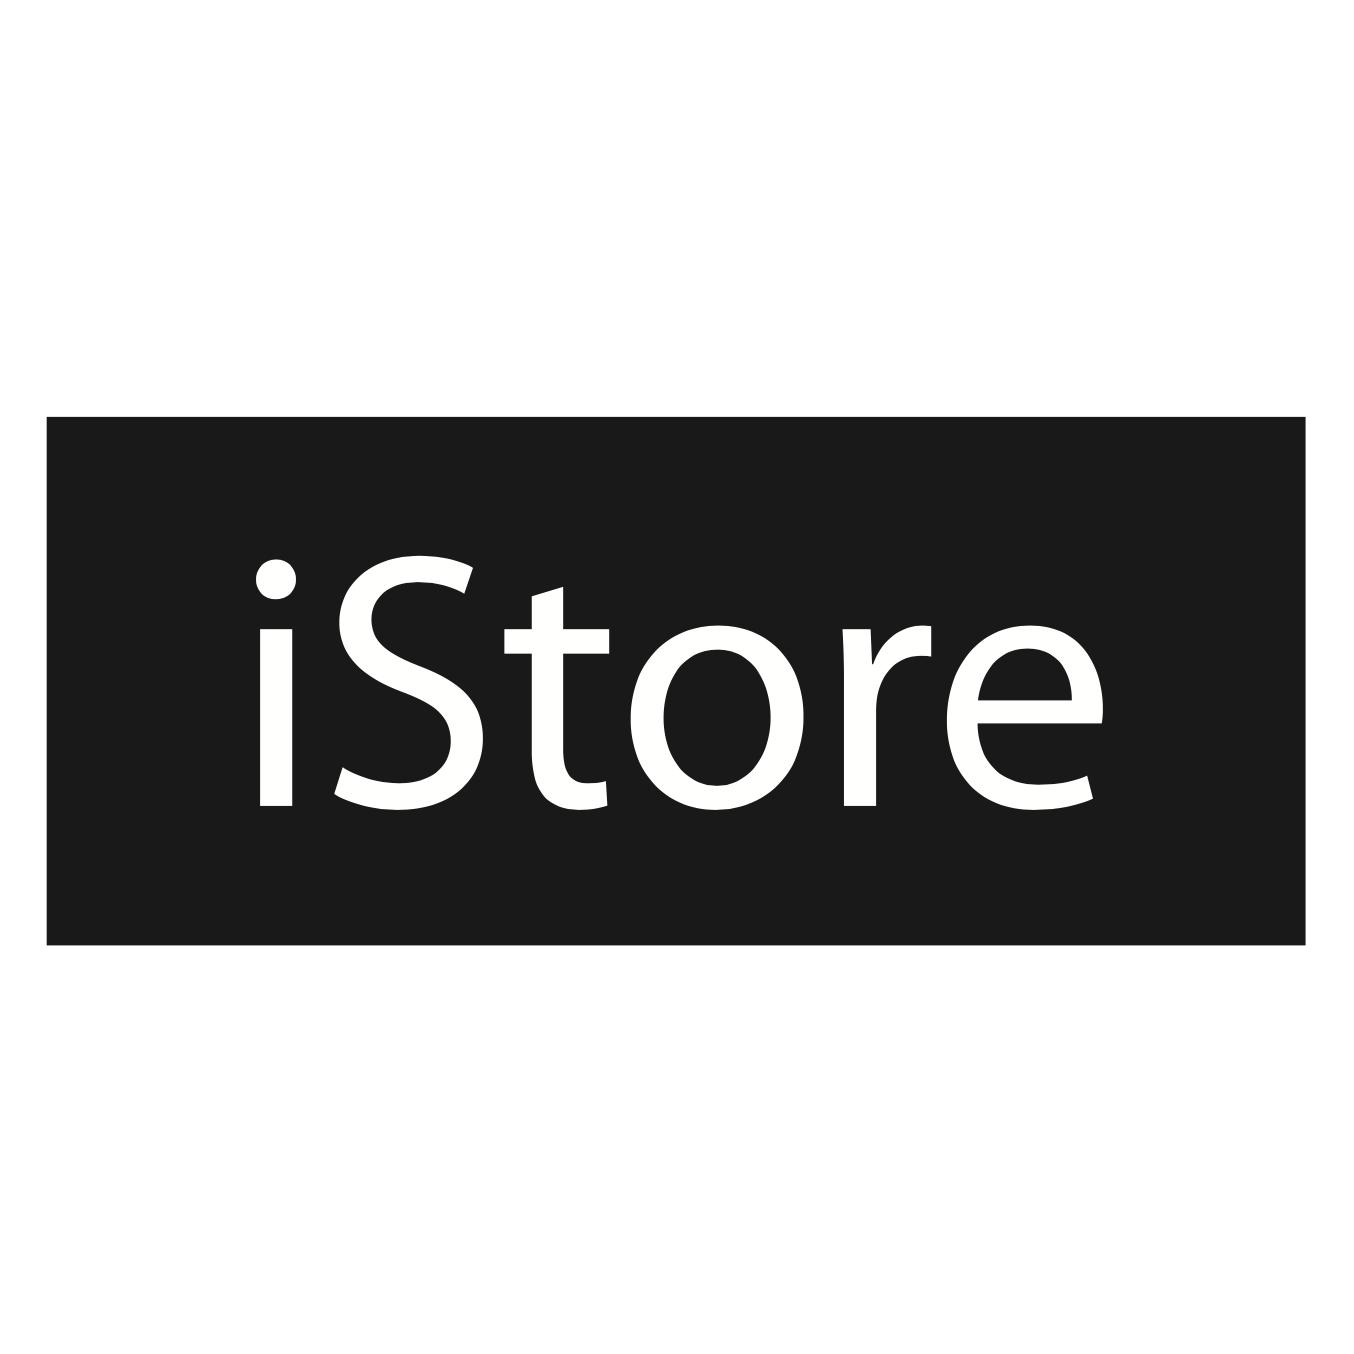 Incase Hardshell Case for 15-inch MacBook Pro Thunderbolt (USB-C) Dots - Blush Pink